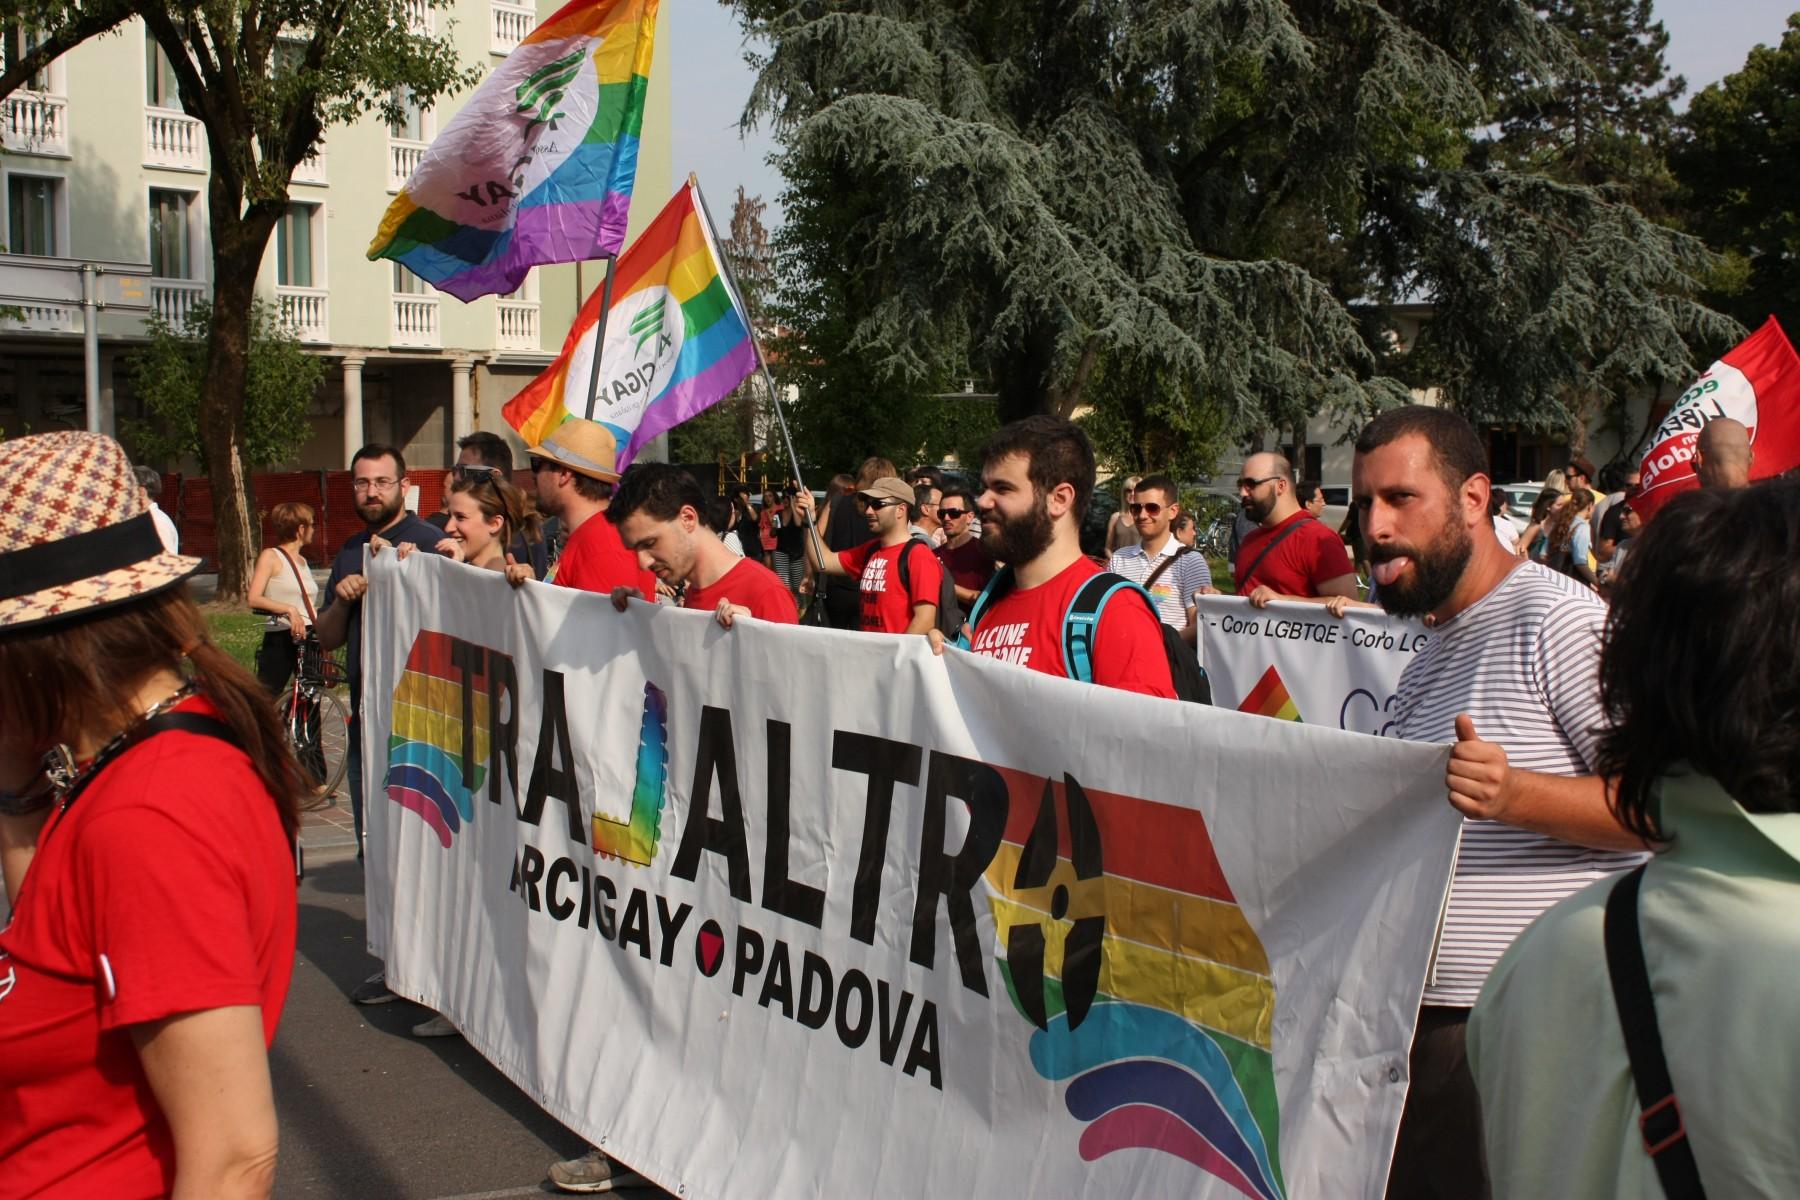 Assemblea Ordinaria Soci Arcigay Tralaltro Padova